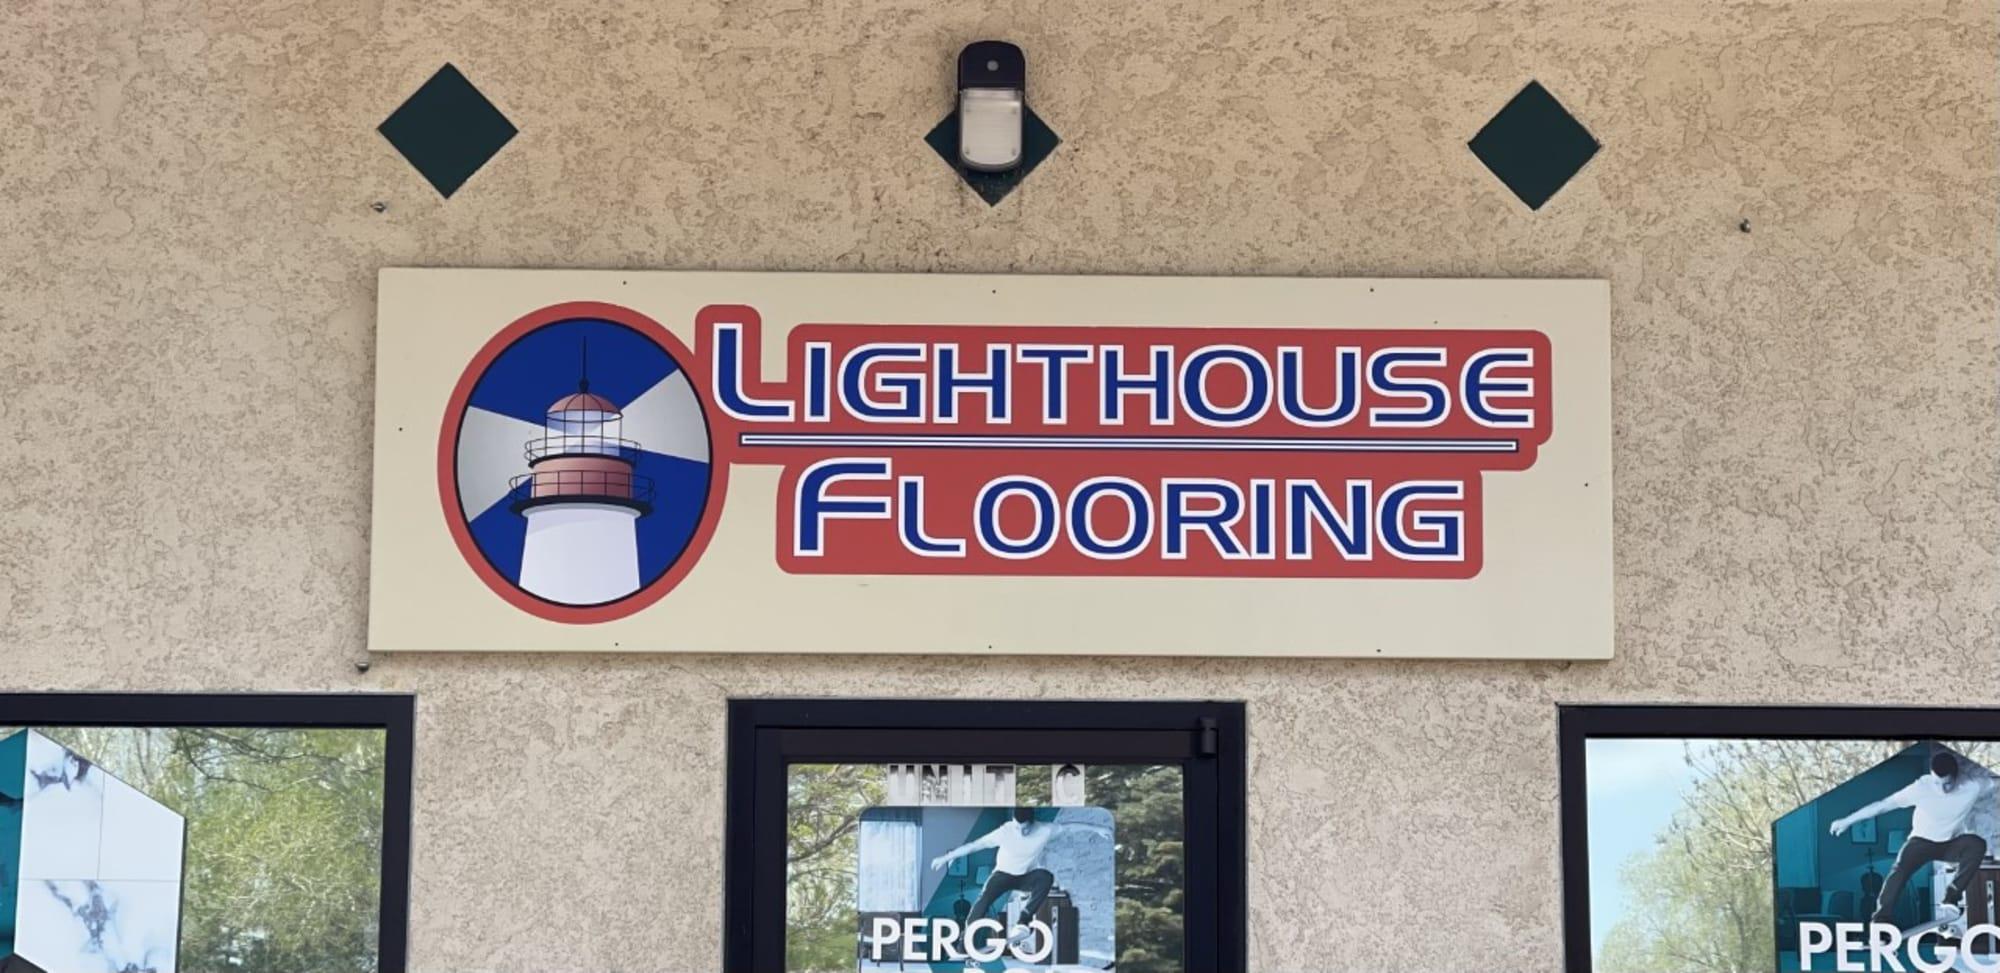 Lighthouse Flooring - 6120 Stadia Ct Colorado Springs, CO 80915